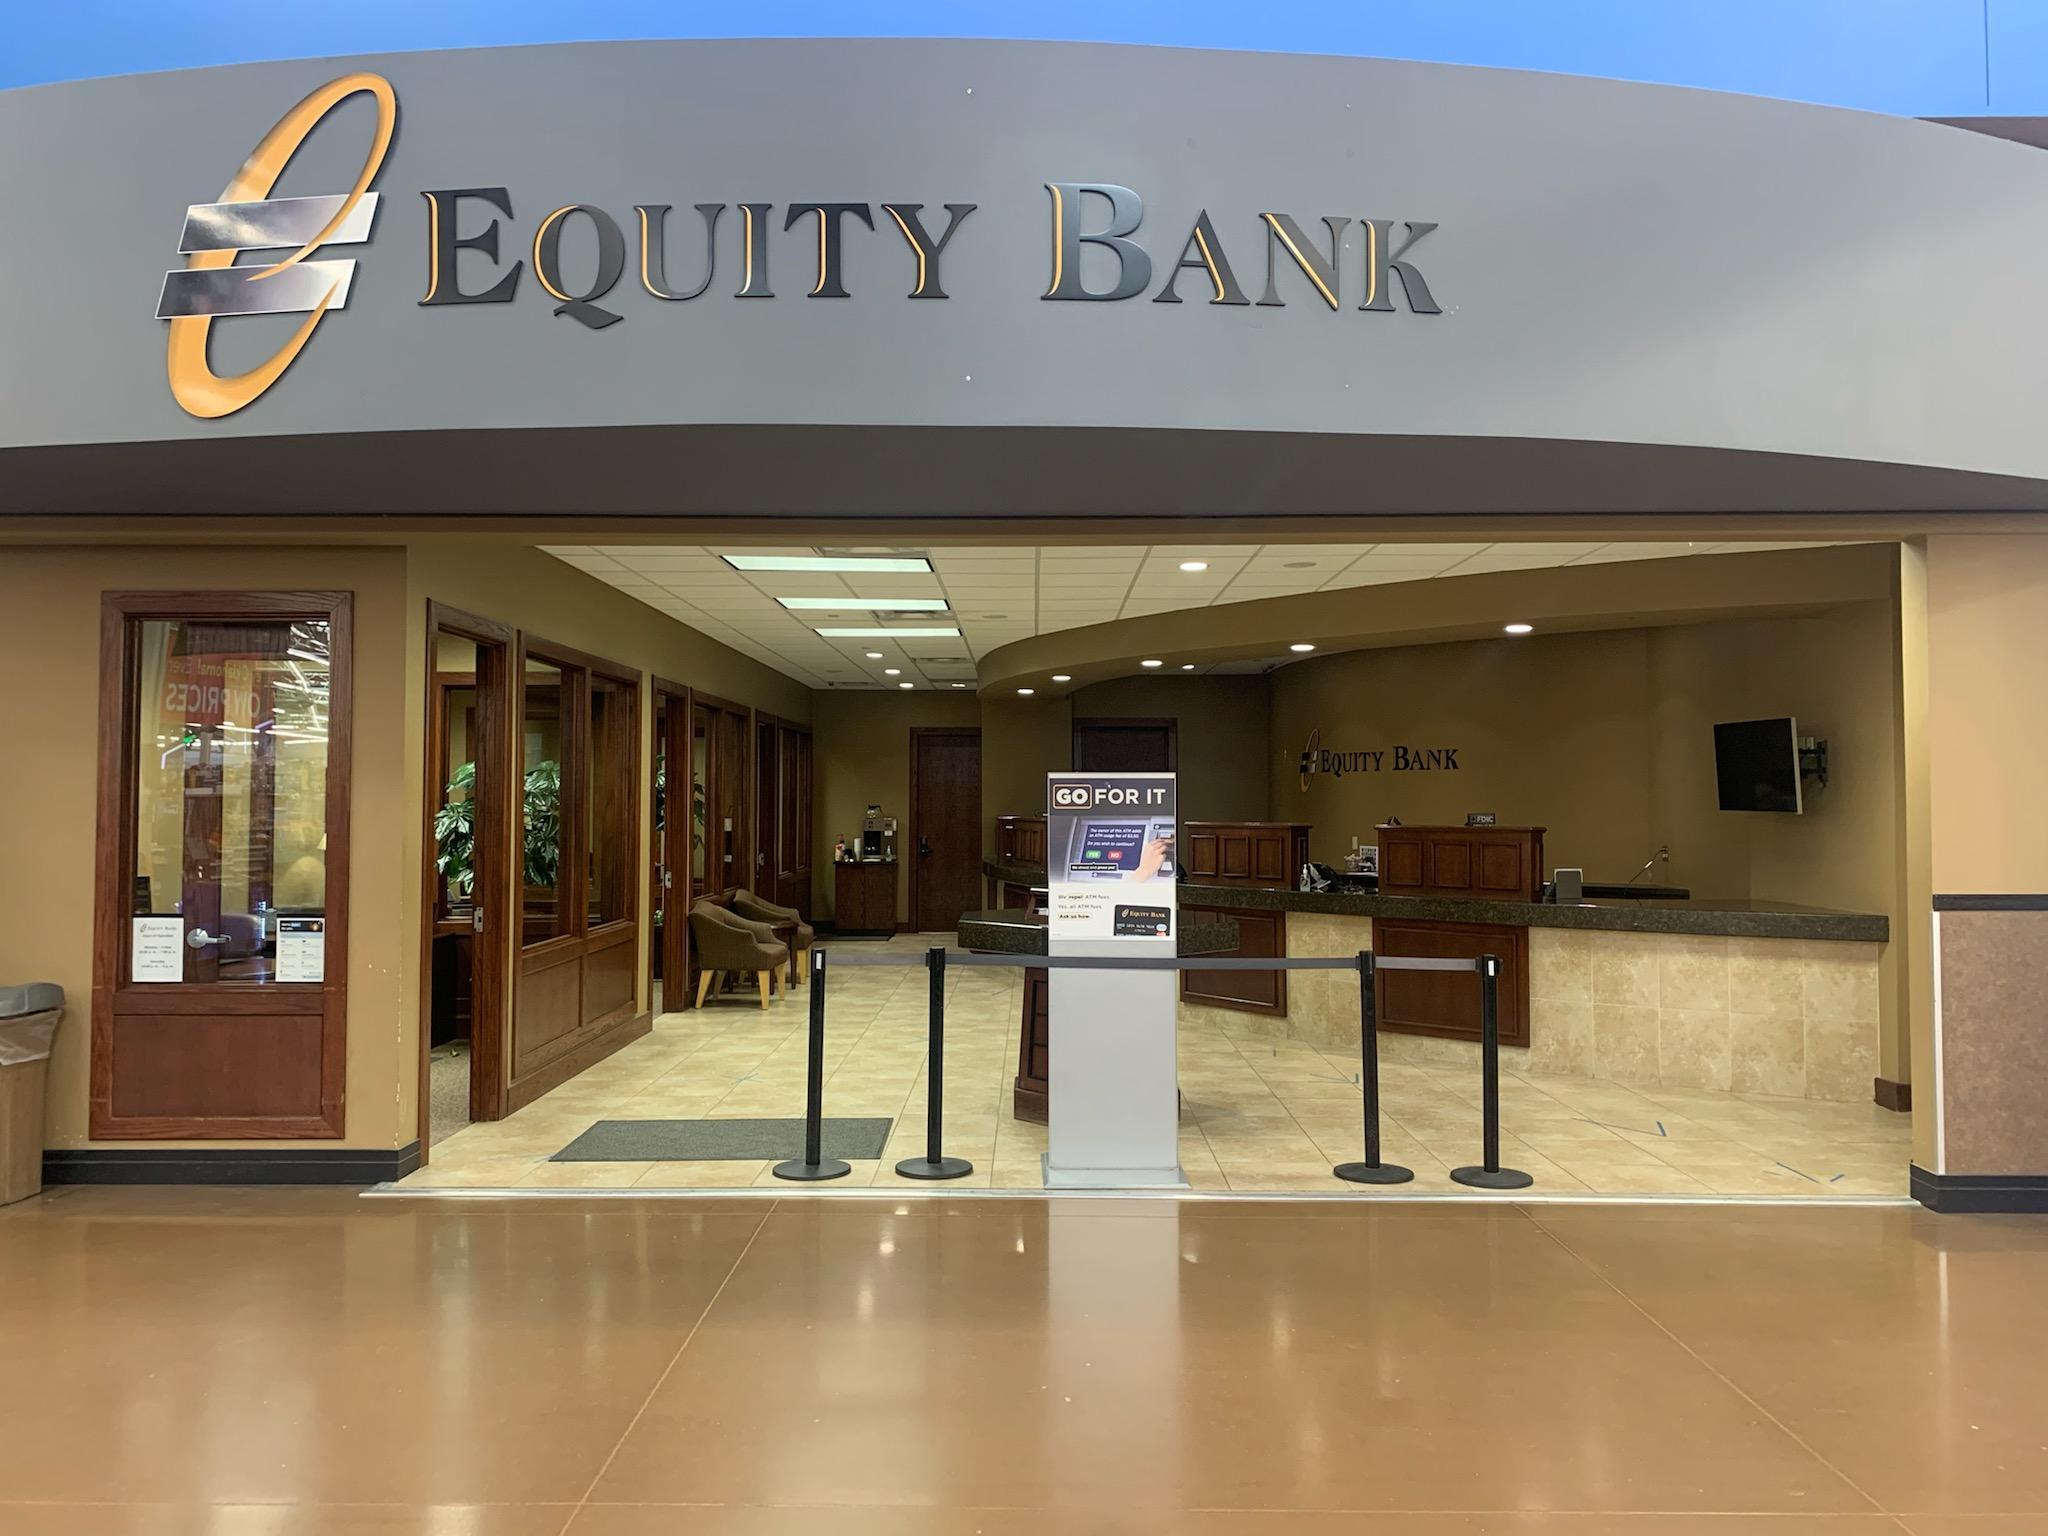 Equity Bank Guymon Walmart branch exterior.